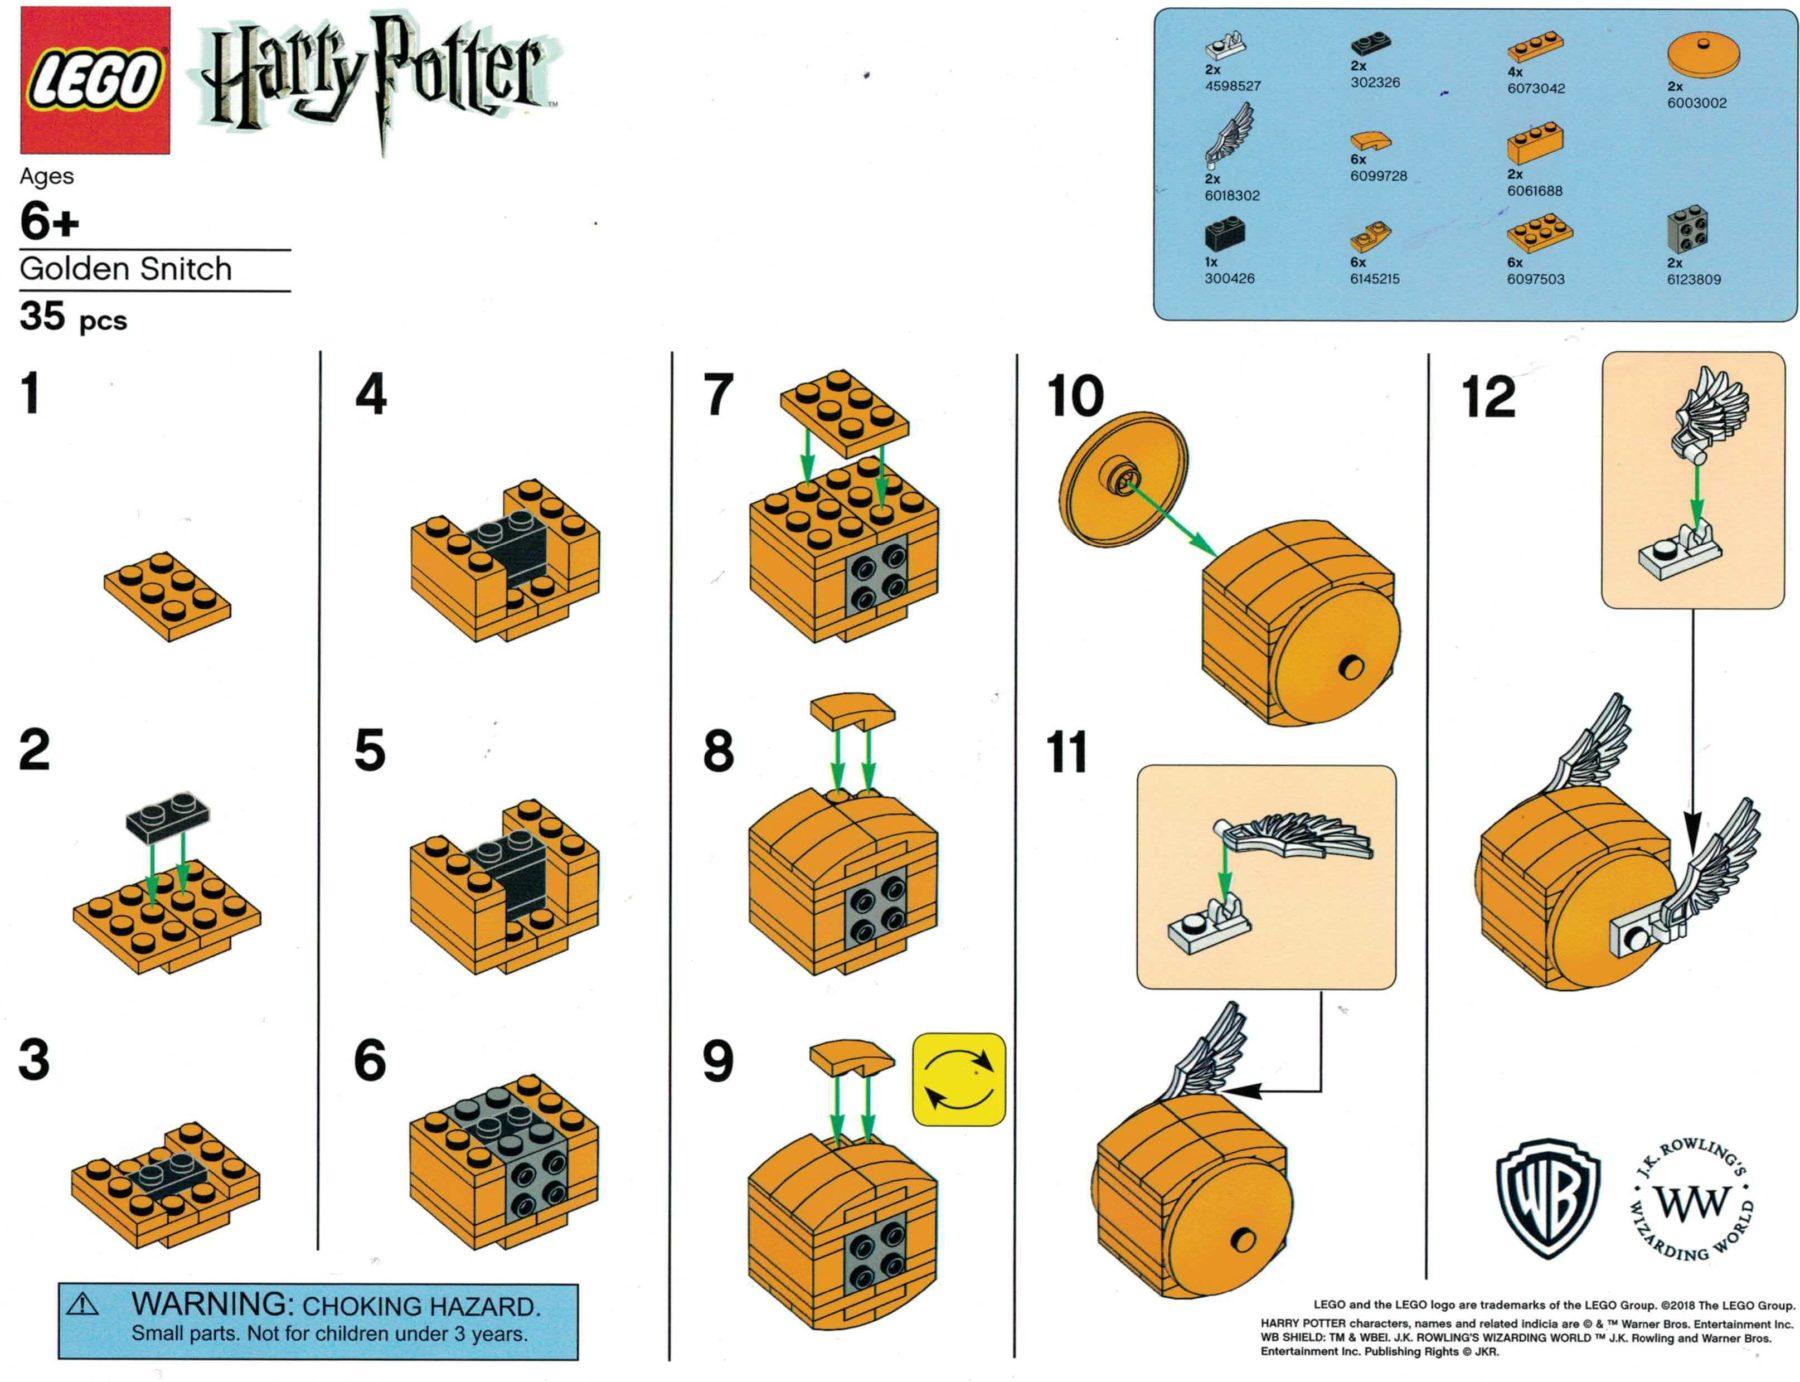 LEGO Harry Potter Goldener Schnatz Anleitung